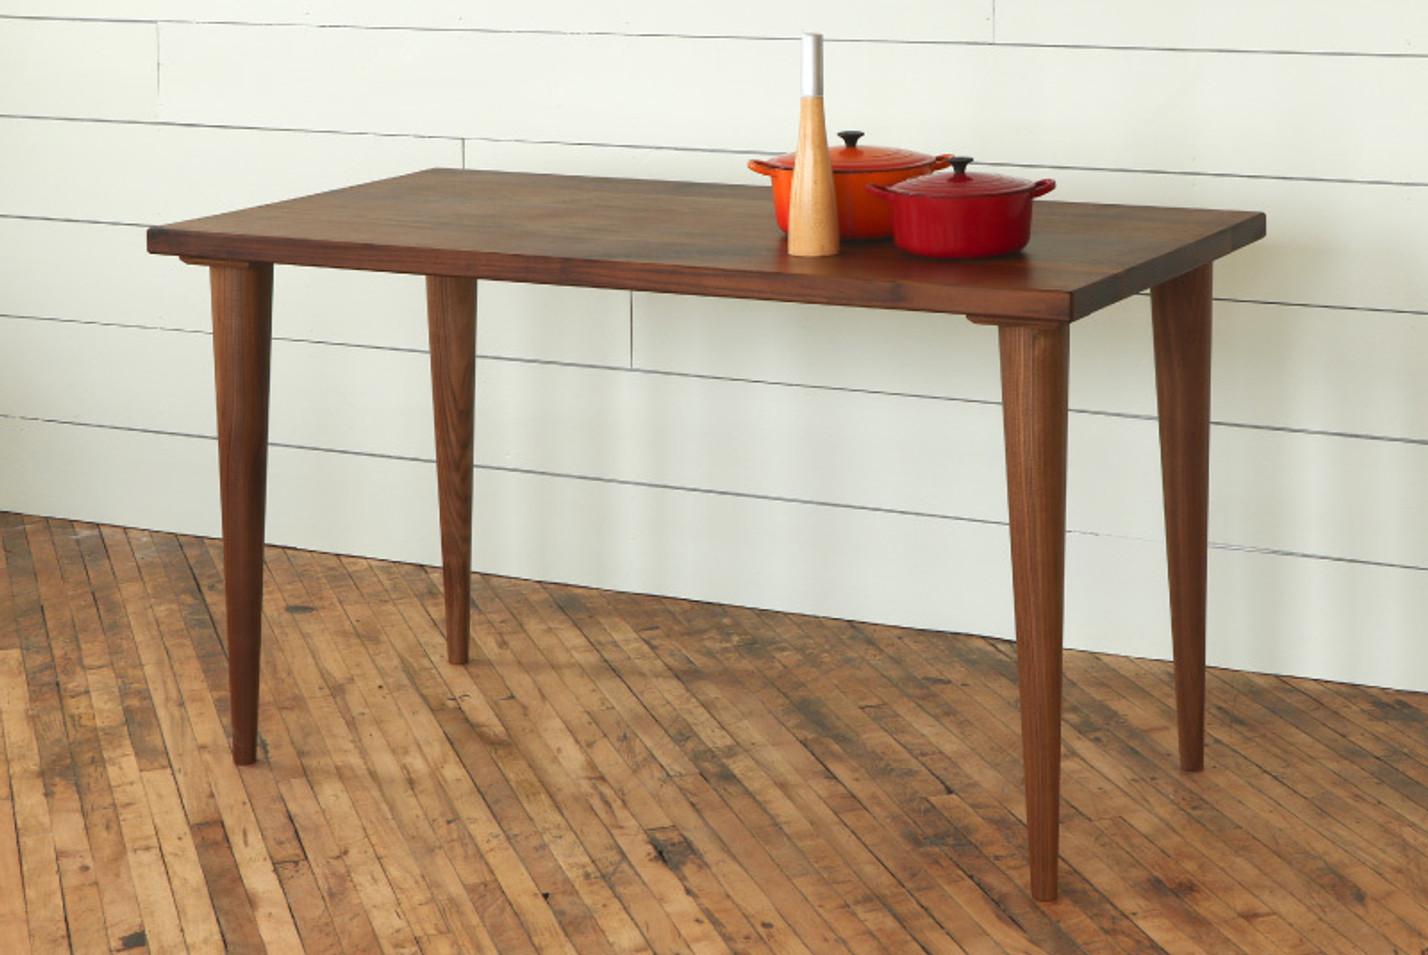 Mccobb Mid Century Modern Round Tapered Table Legs Tablelegs